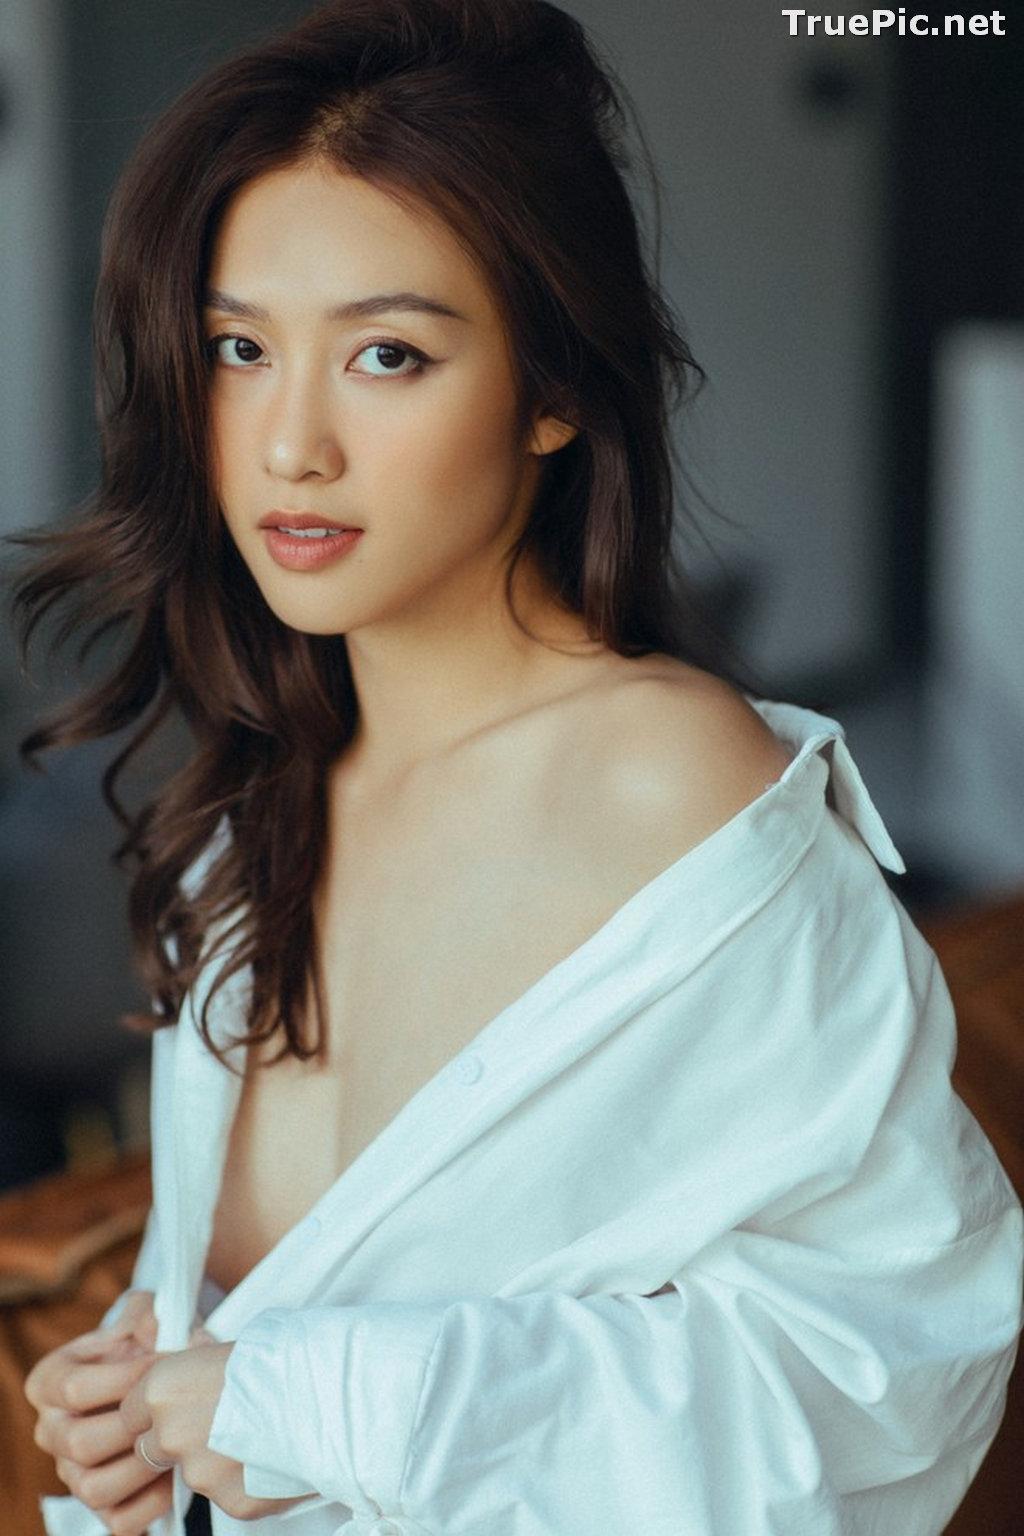 Image Vietnamese Hot Girl - Kha Ngan - Gentle Young Charming - TruePic.net - Picture-4